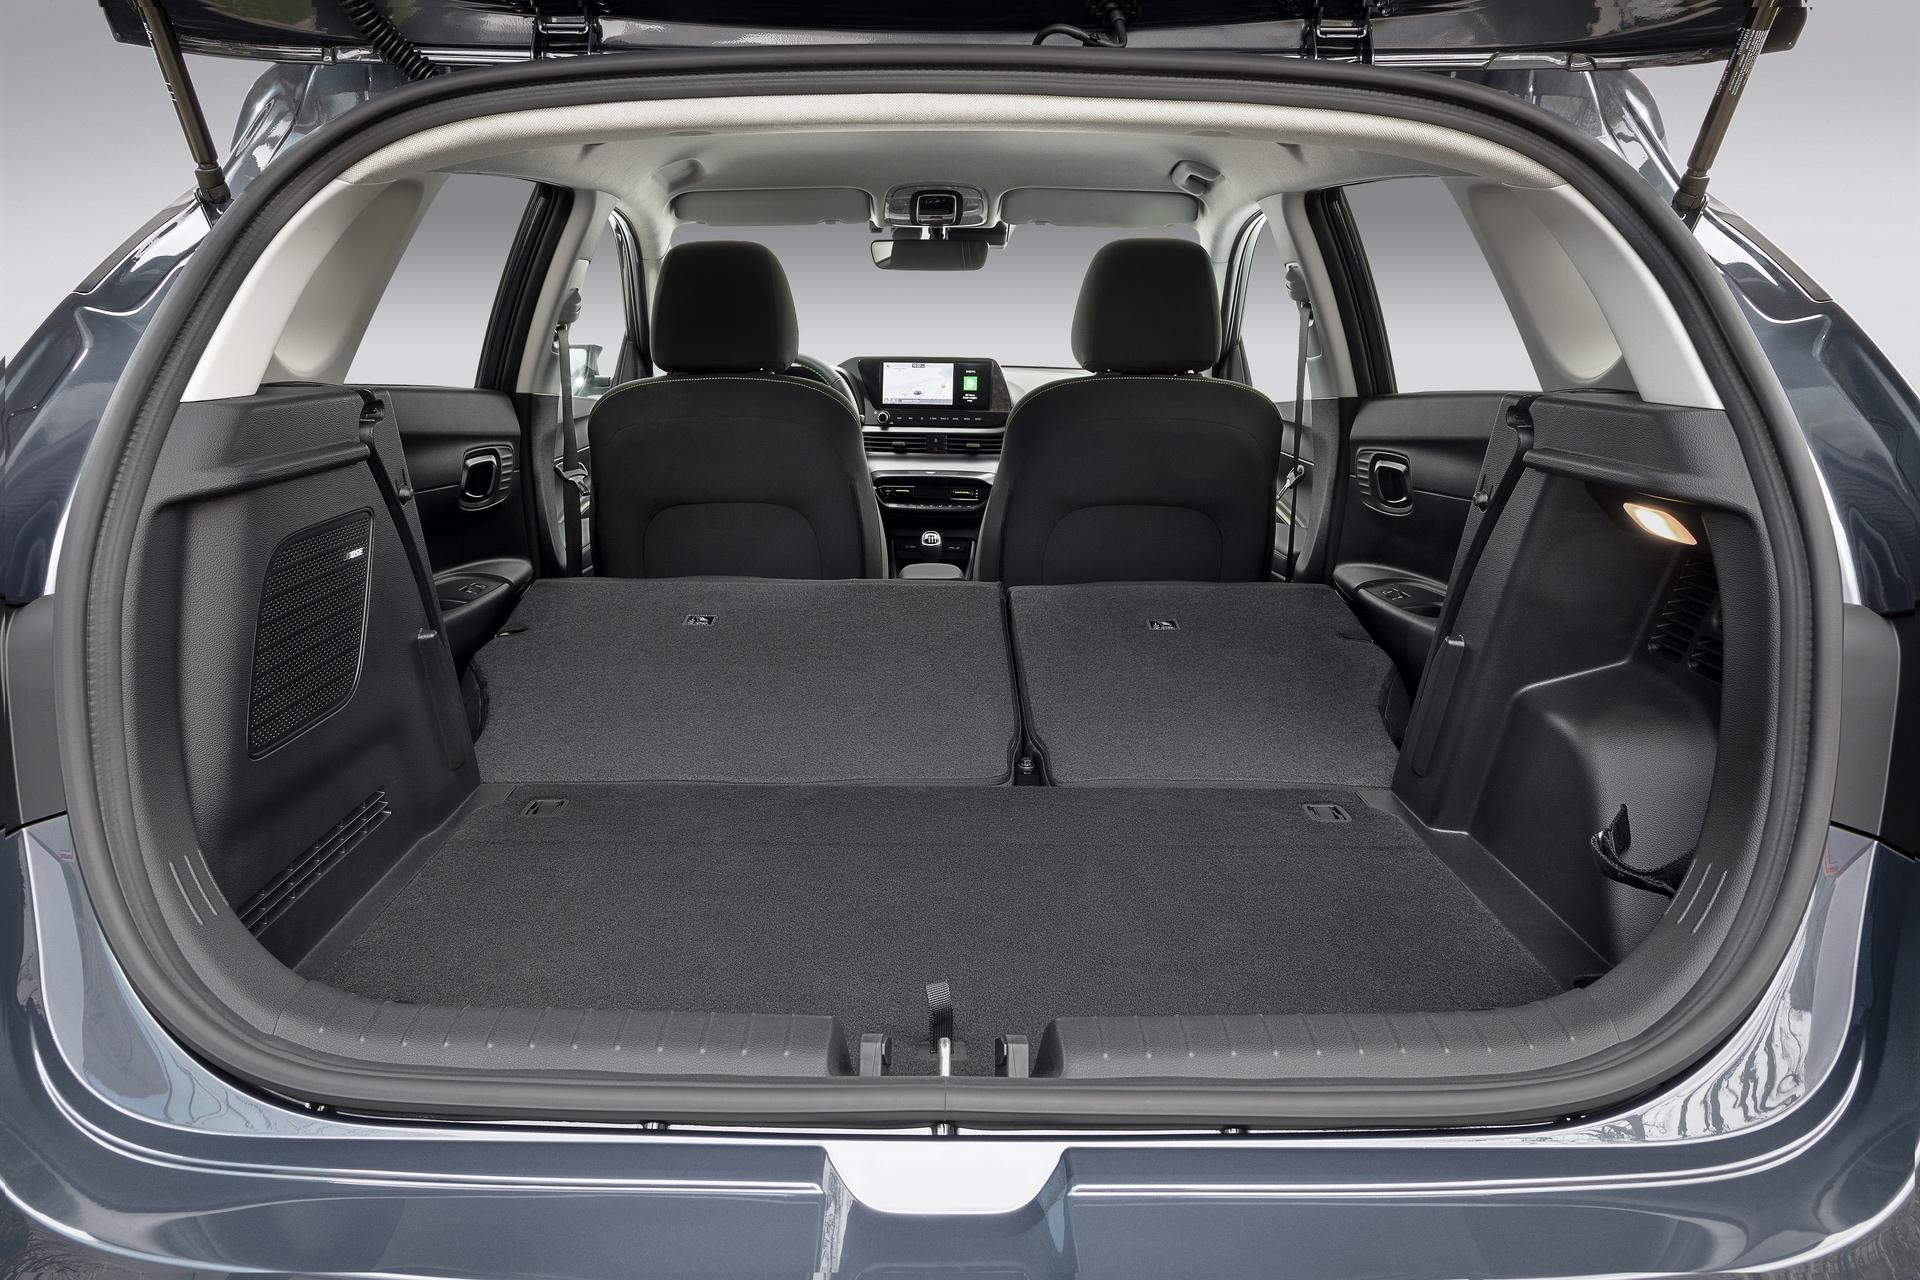 Hyundai_i20_interior_0009